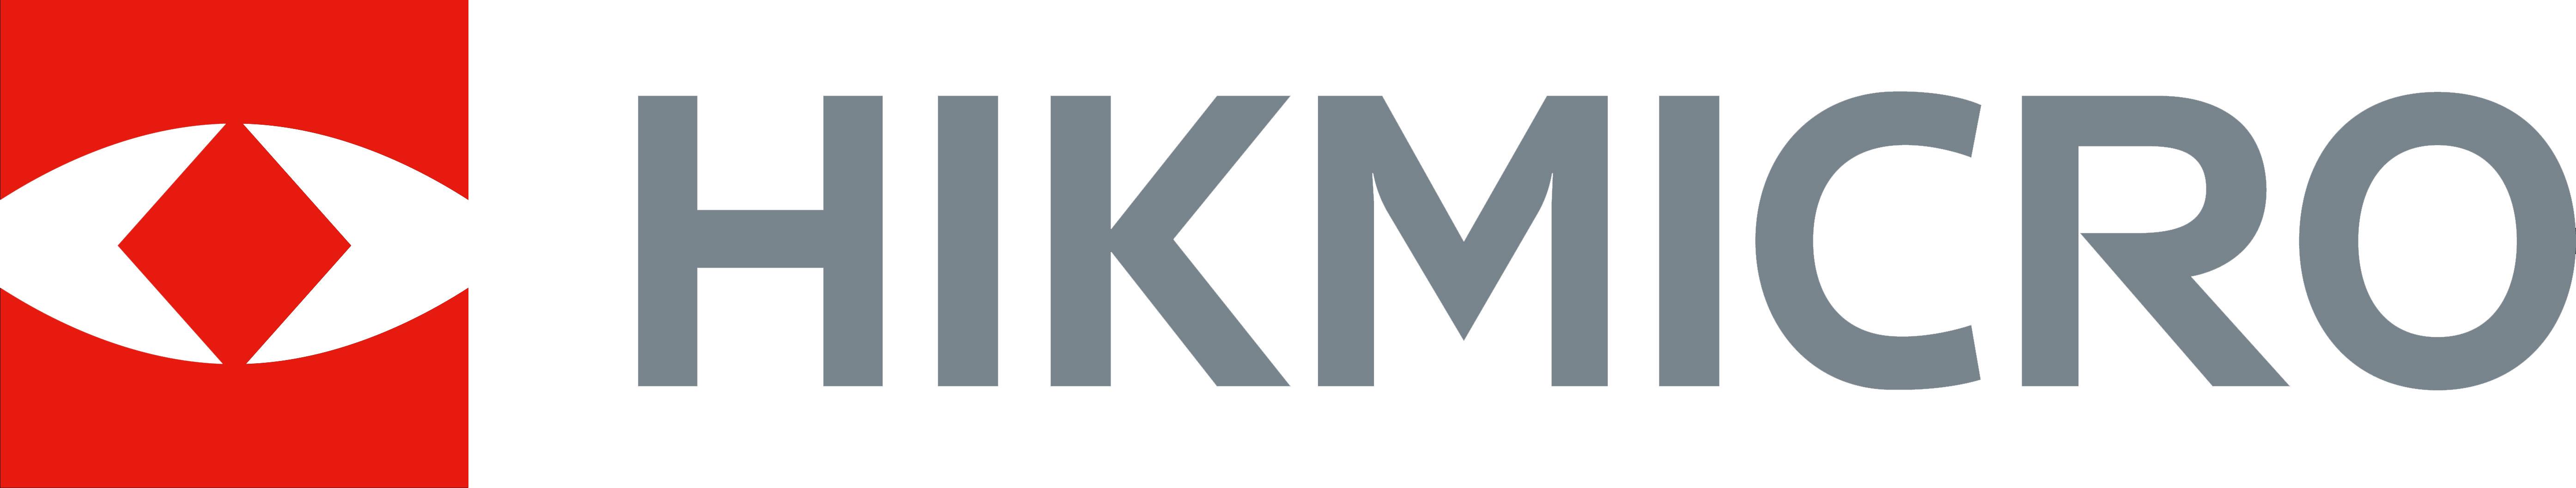 hikmicro-logo.jpg